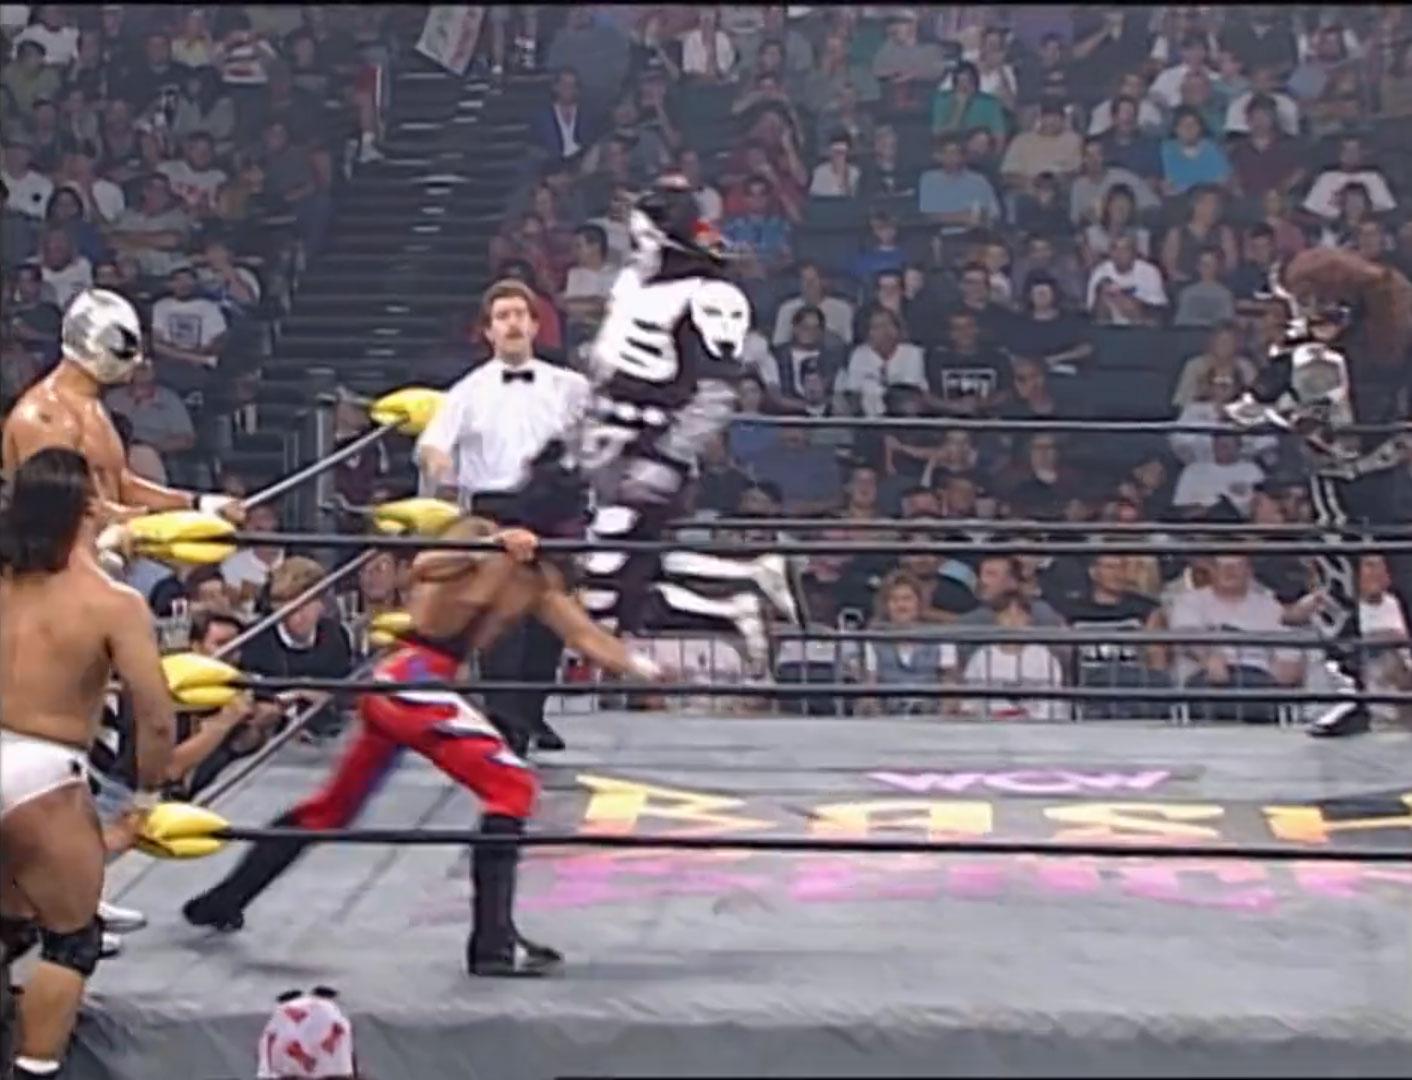 Juventud Guerrera, Hector Garza, Lizmark, Jr. vs. La Parka, Psicosis, Villano IV WCW Bash At The Beach '97 Jul 13th 1997